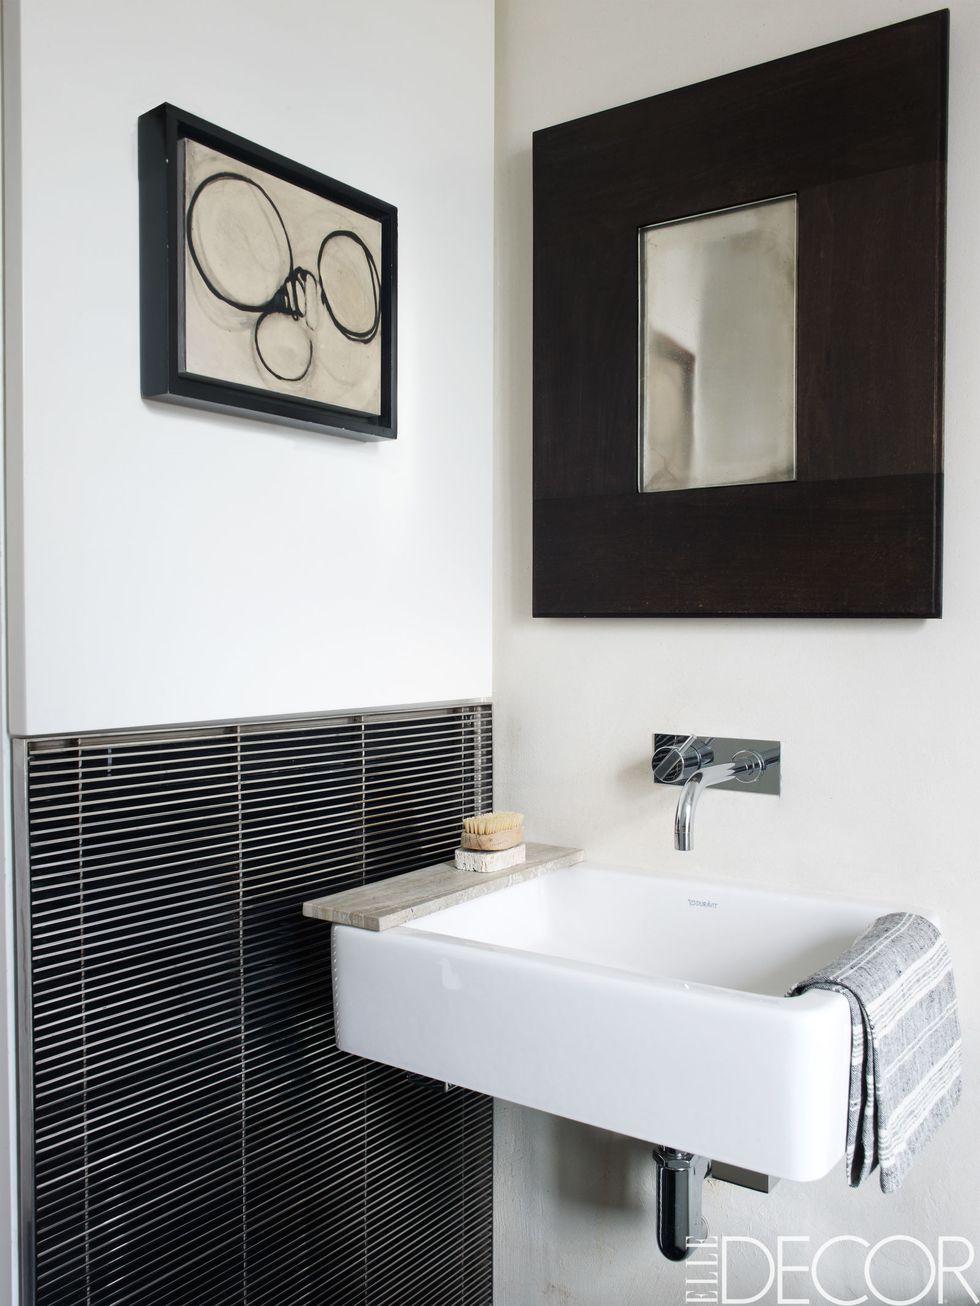 44 Best Small Bathroom Ideas - Bathroom Designs for Small ... on Bathroom Ideas For Small Spaces  id=54392